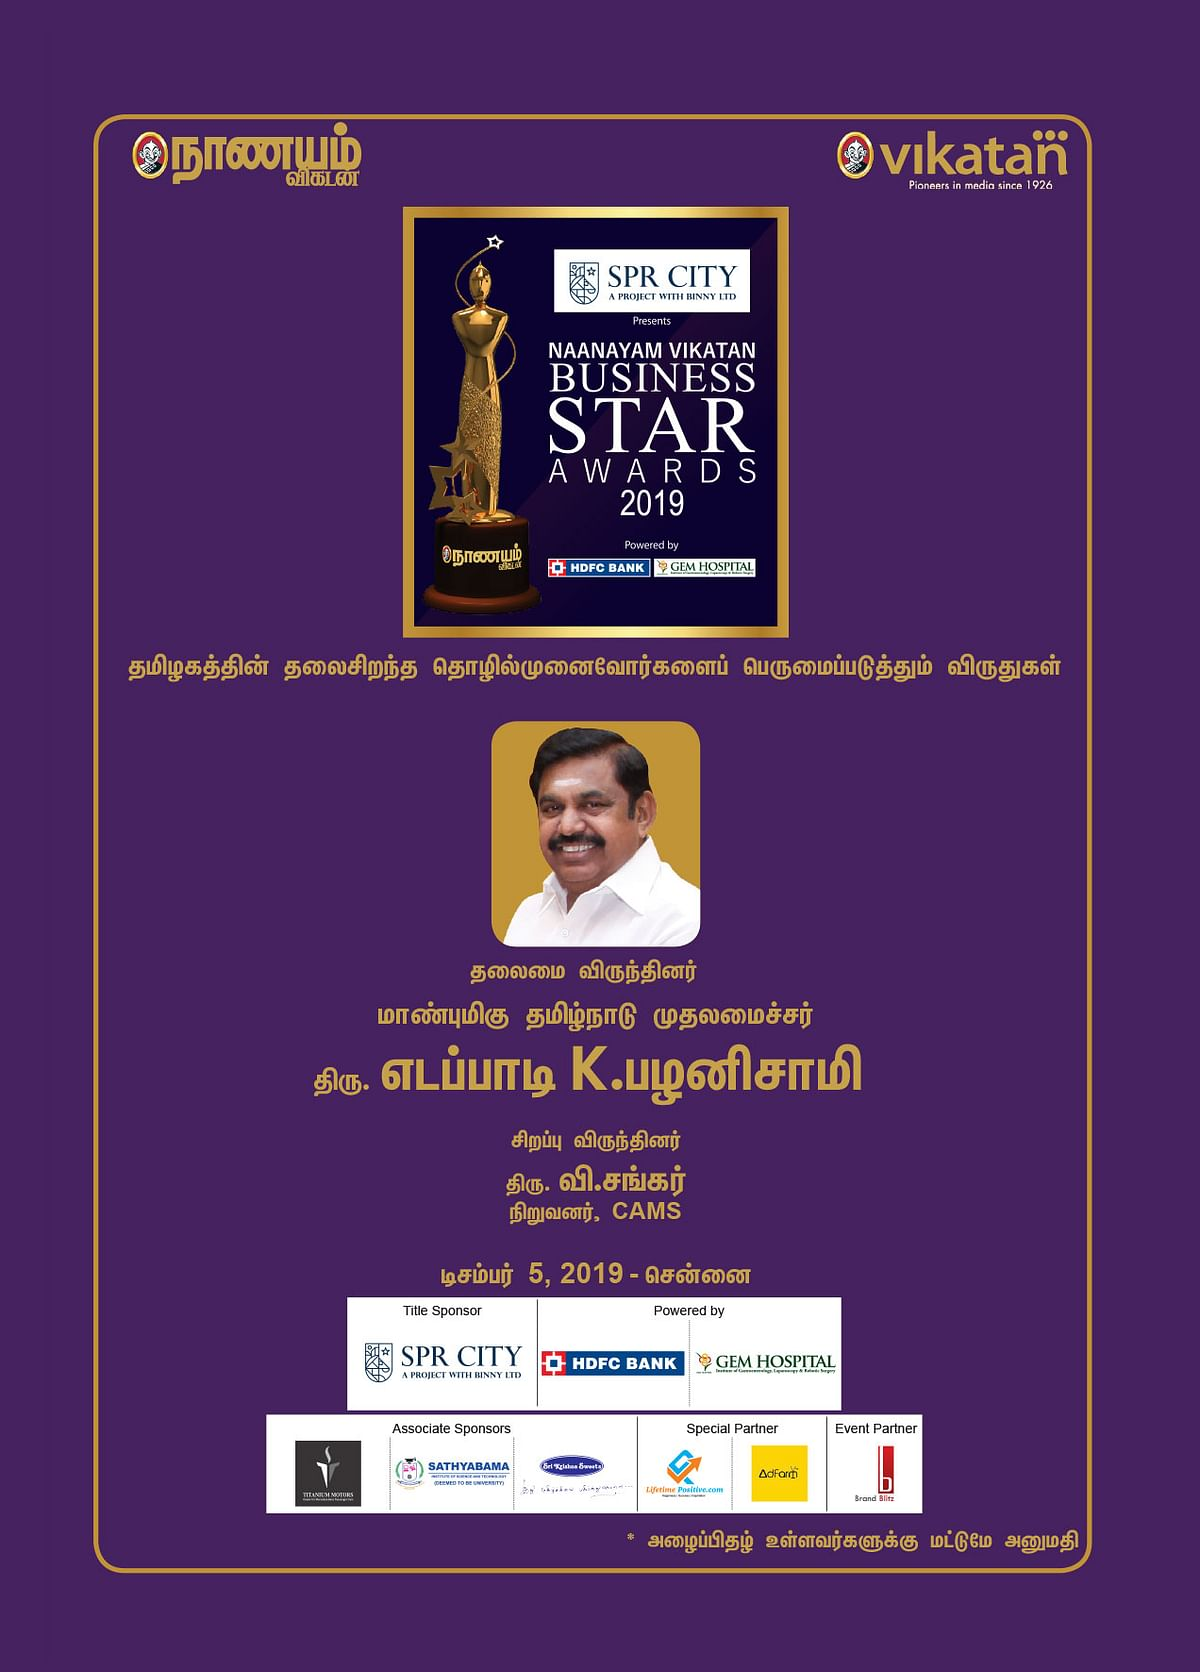 NAANAYAM VIKATAN BUSINESS STAR AWARDS 2019